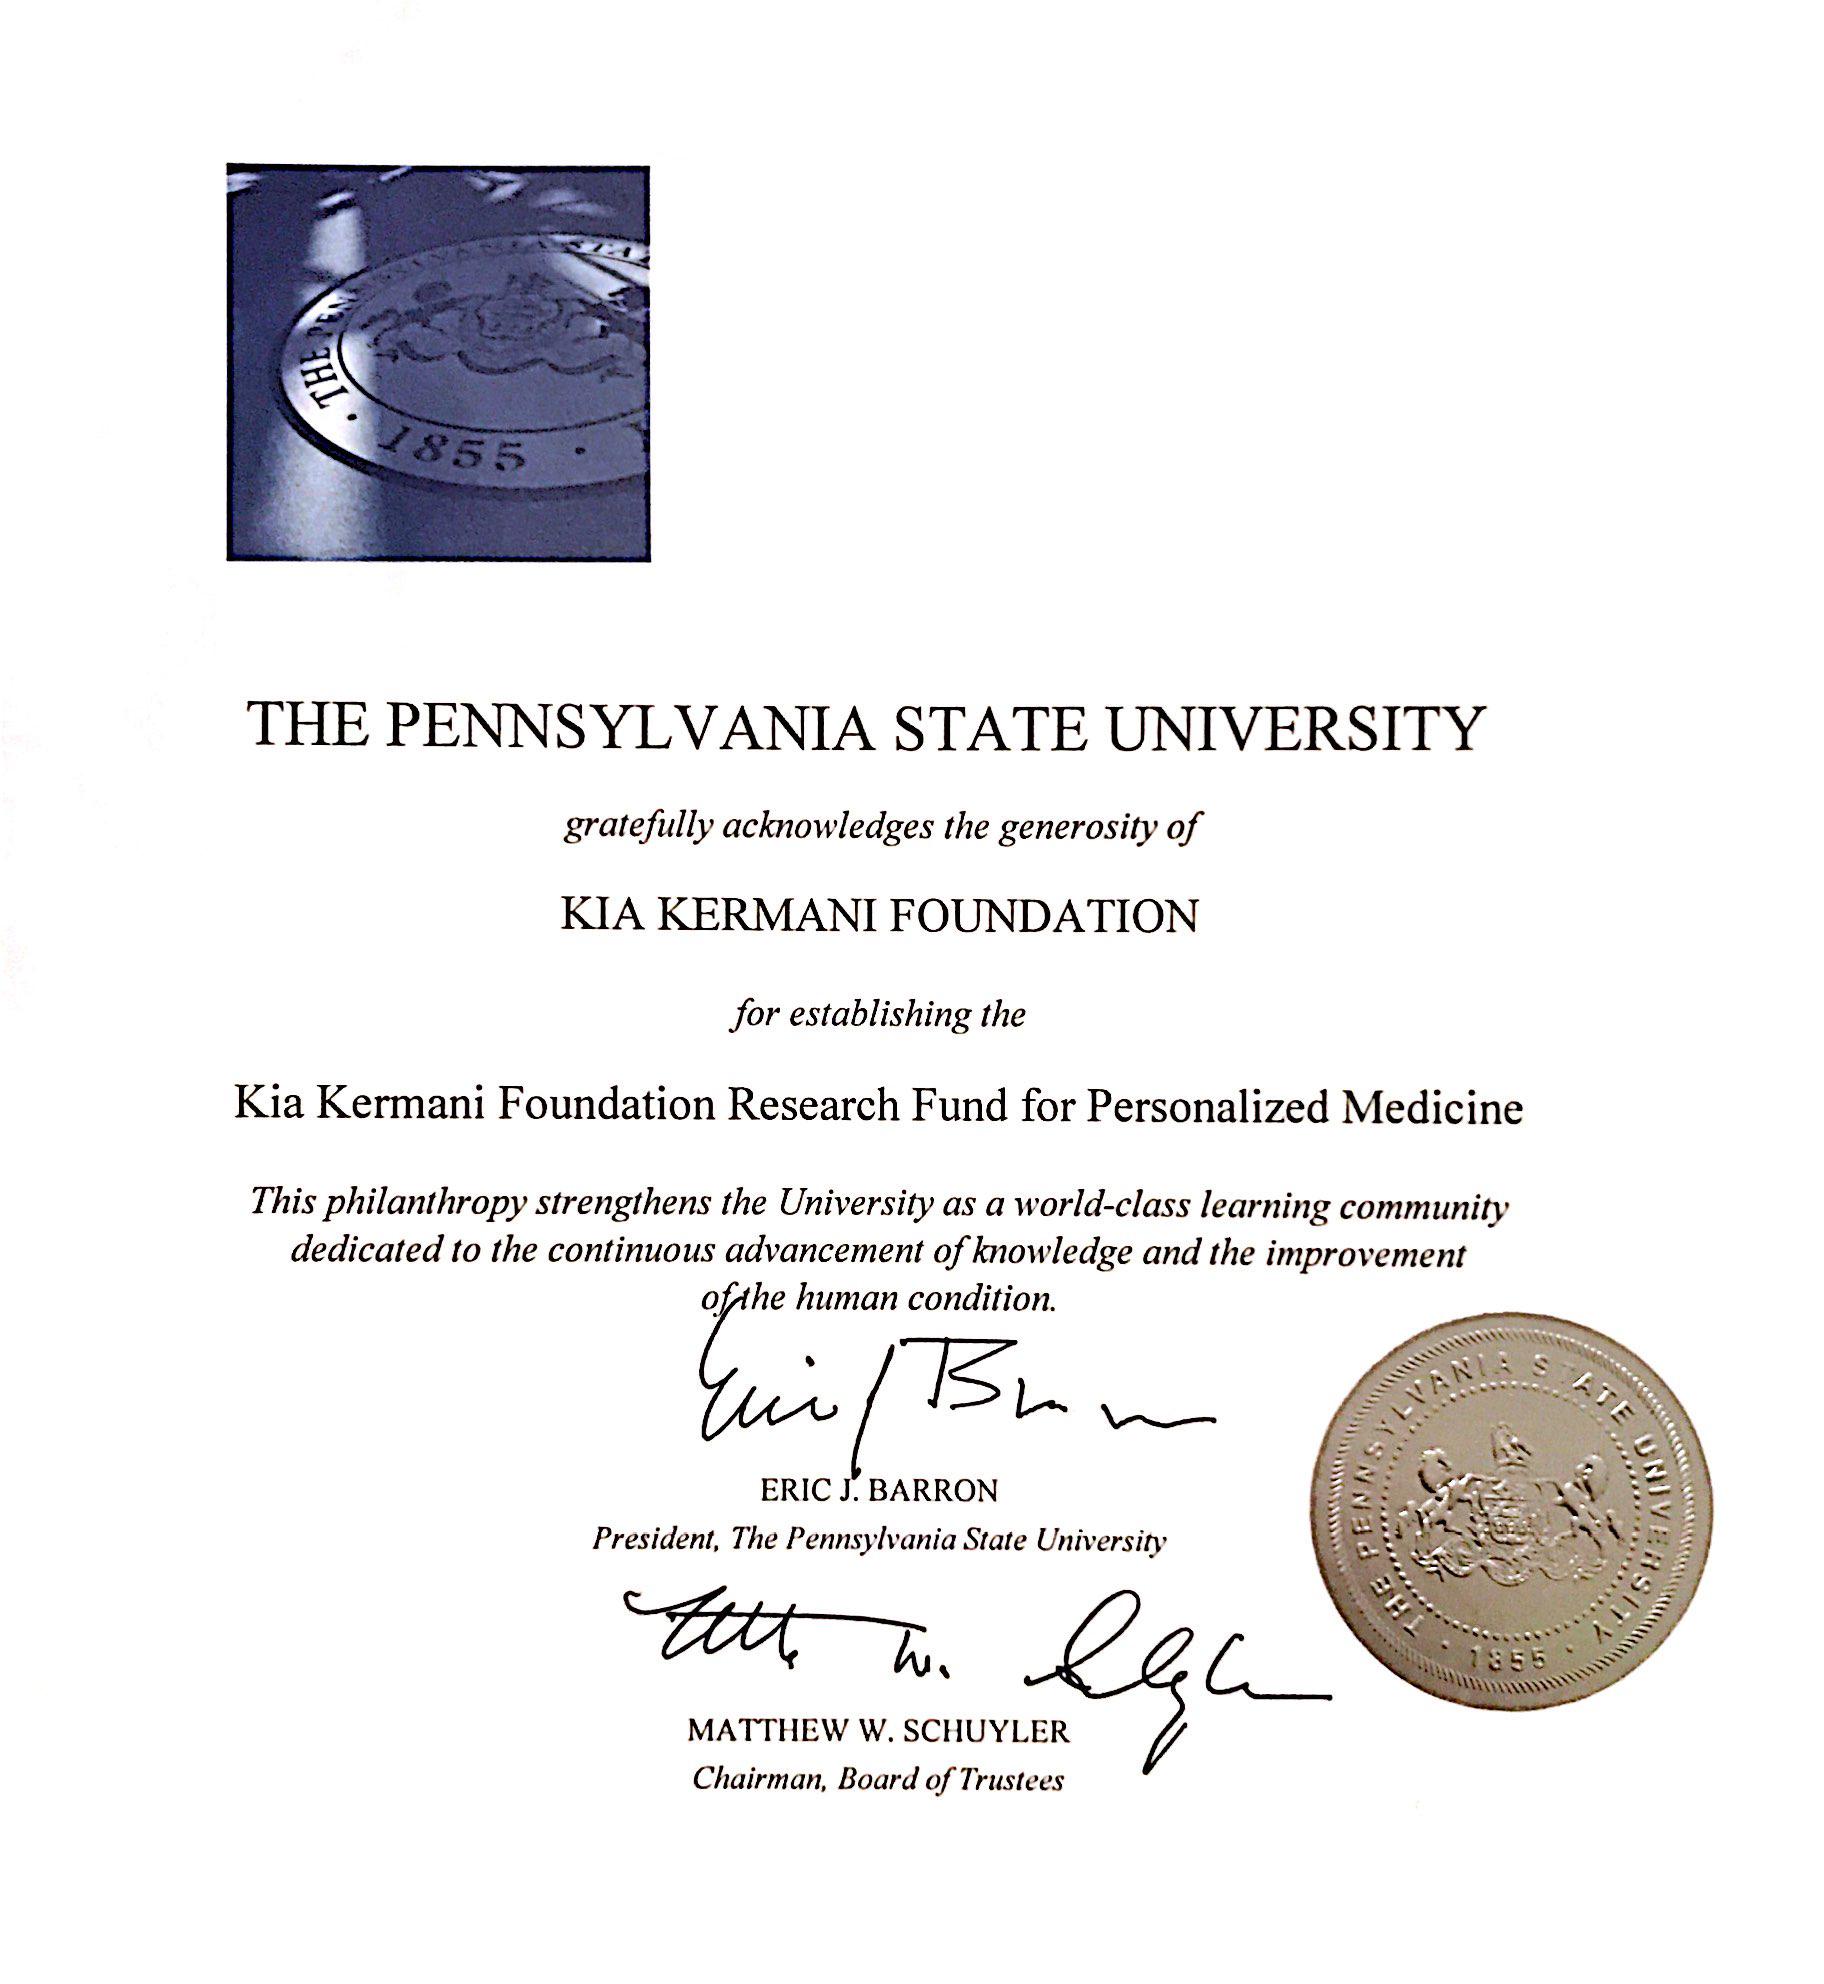 Penn State Acknowledgement